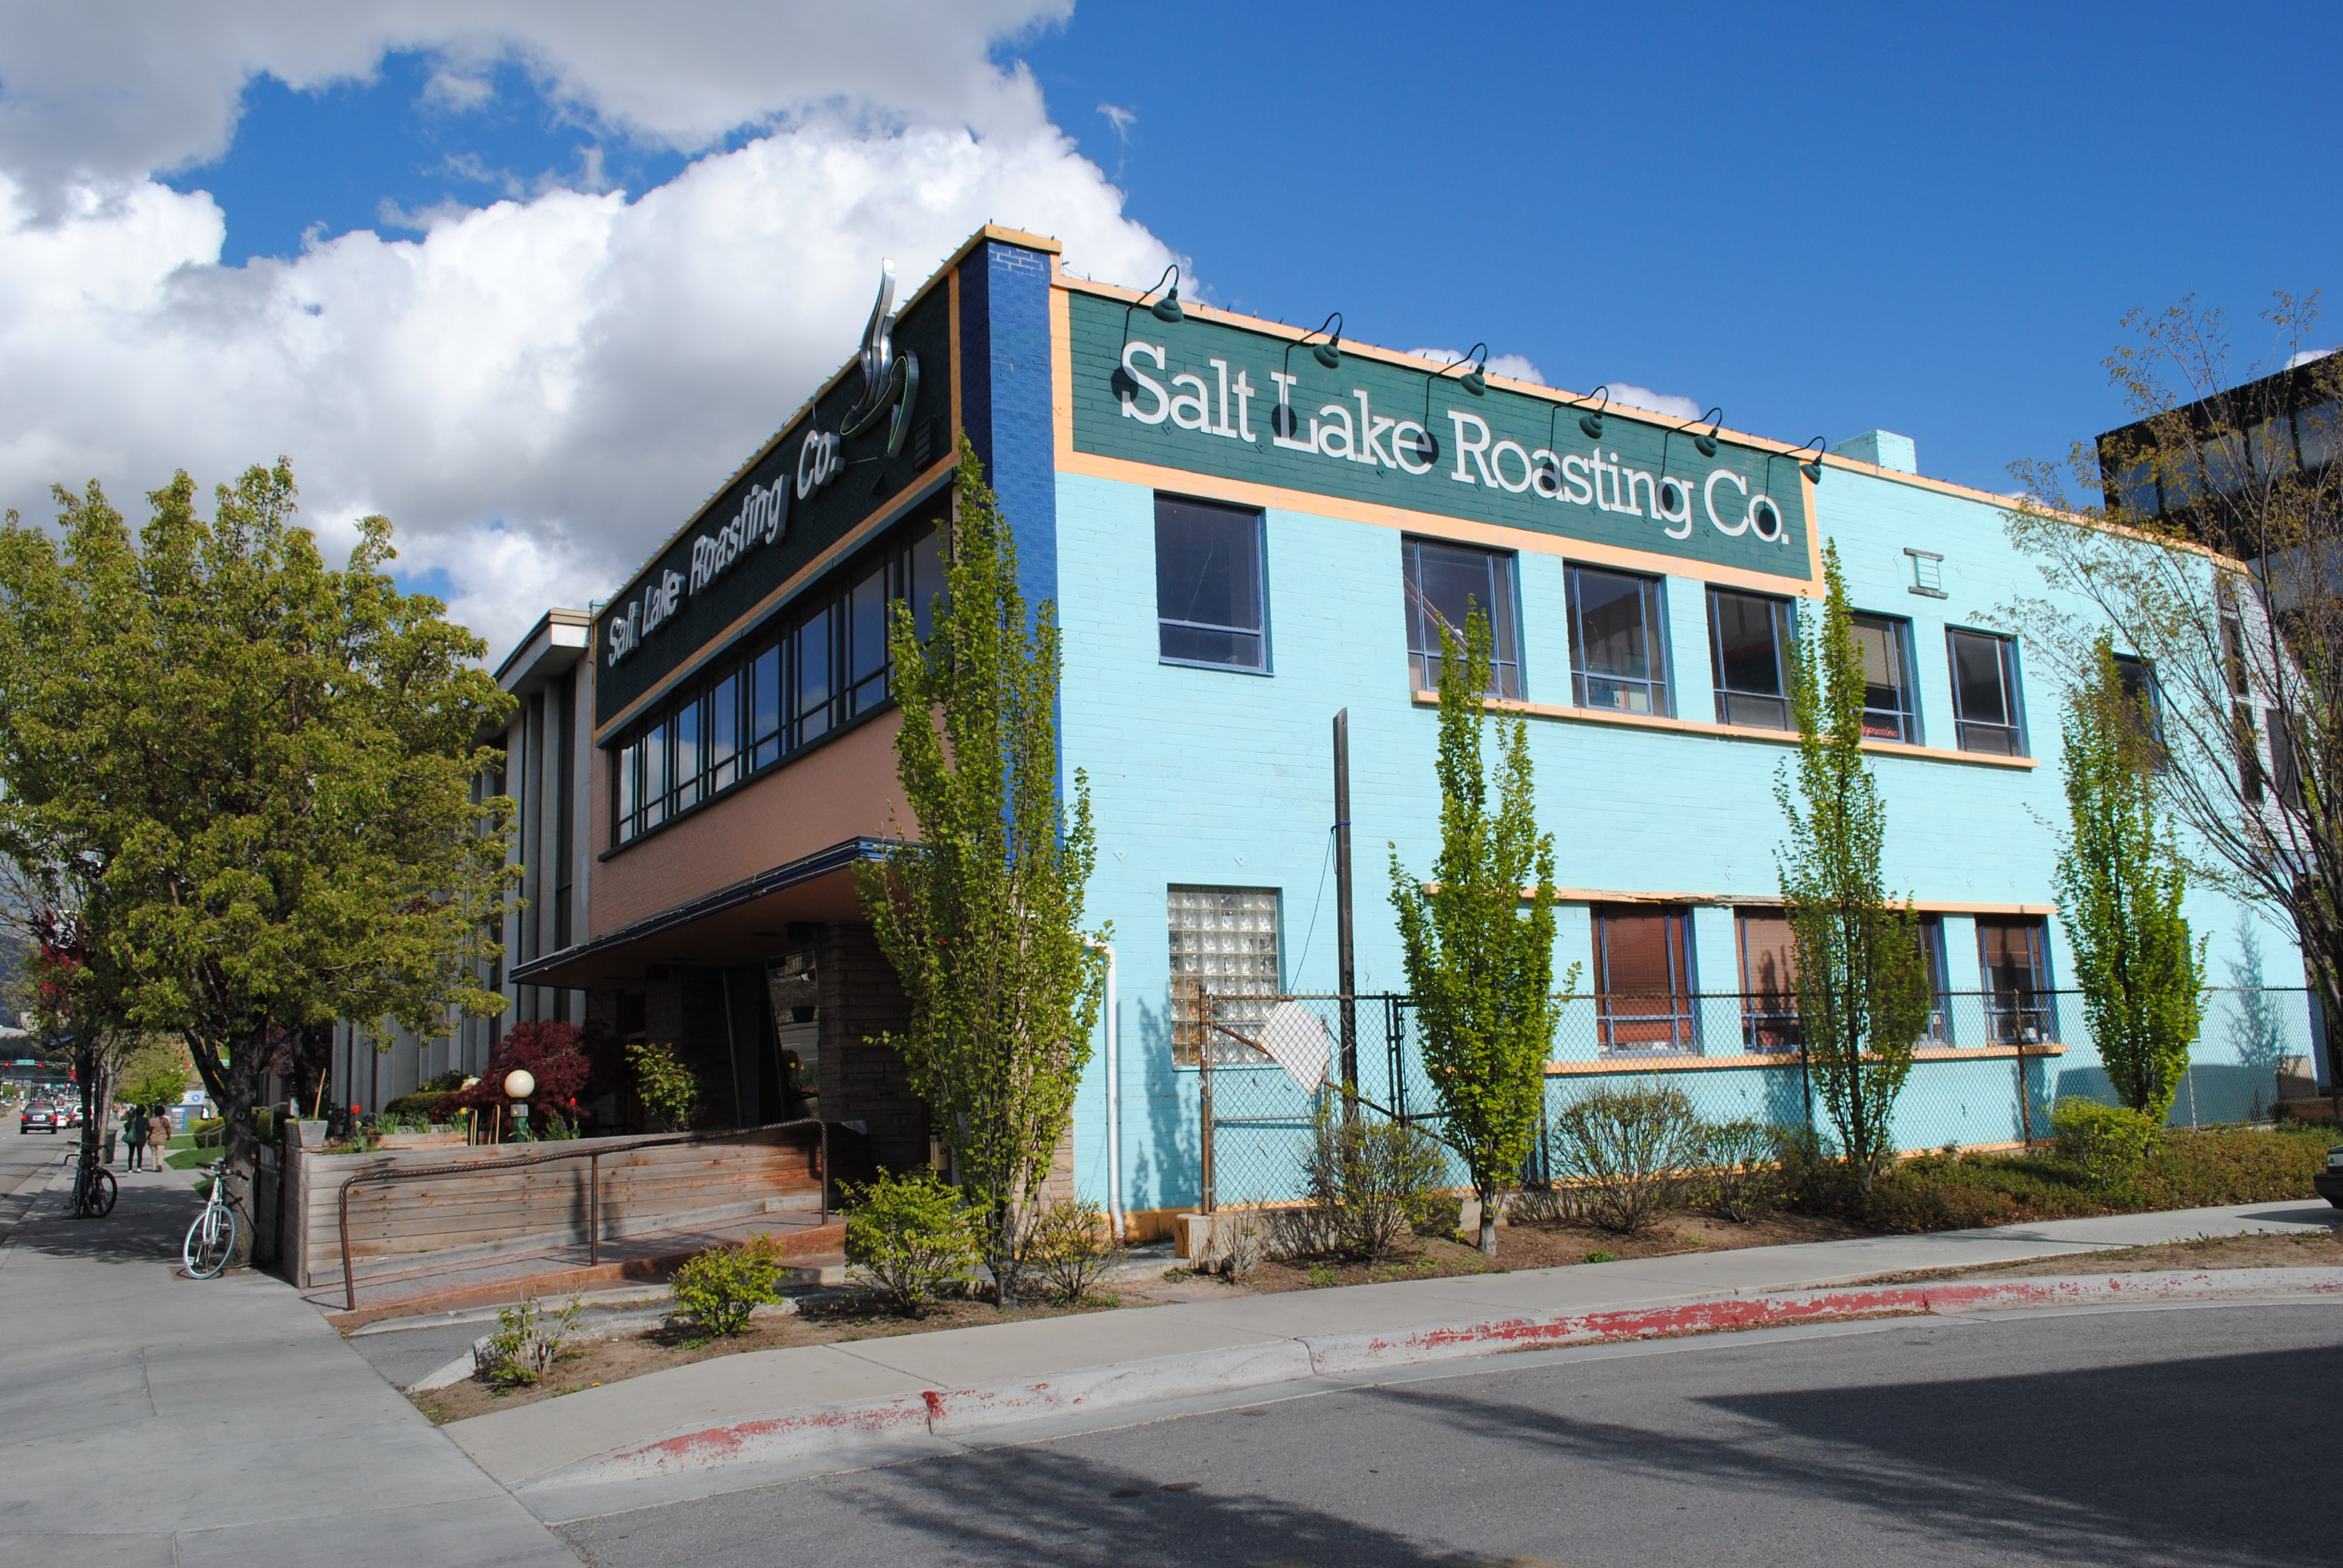 The Top 10 Coffee Shops In Salt Lake City, Utah